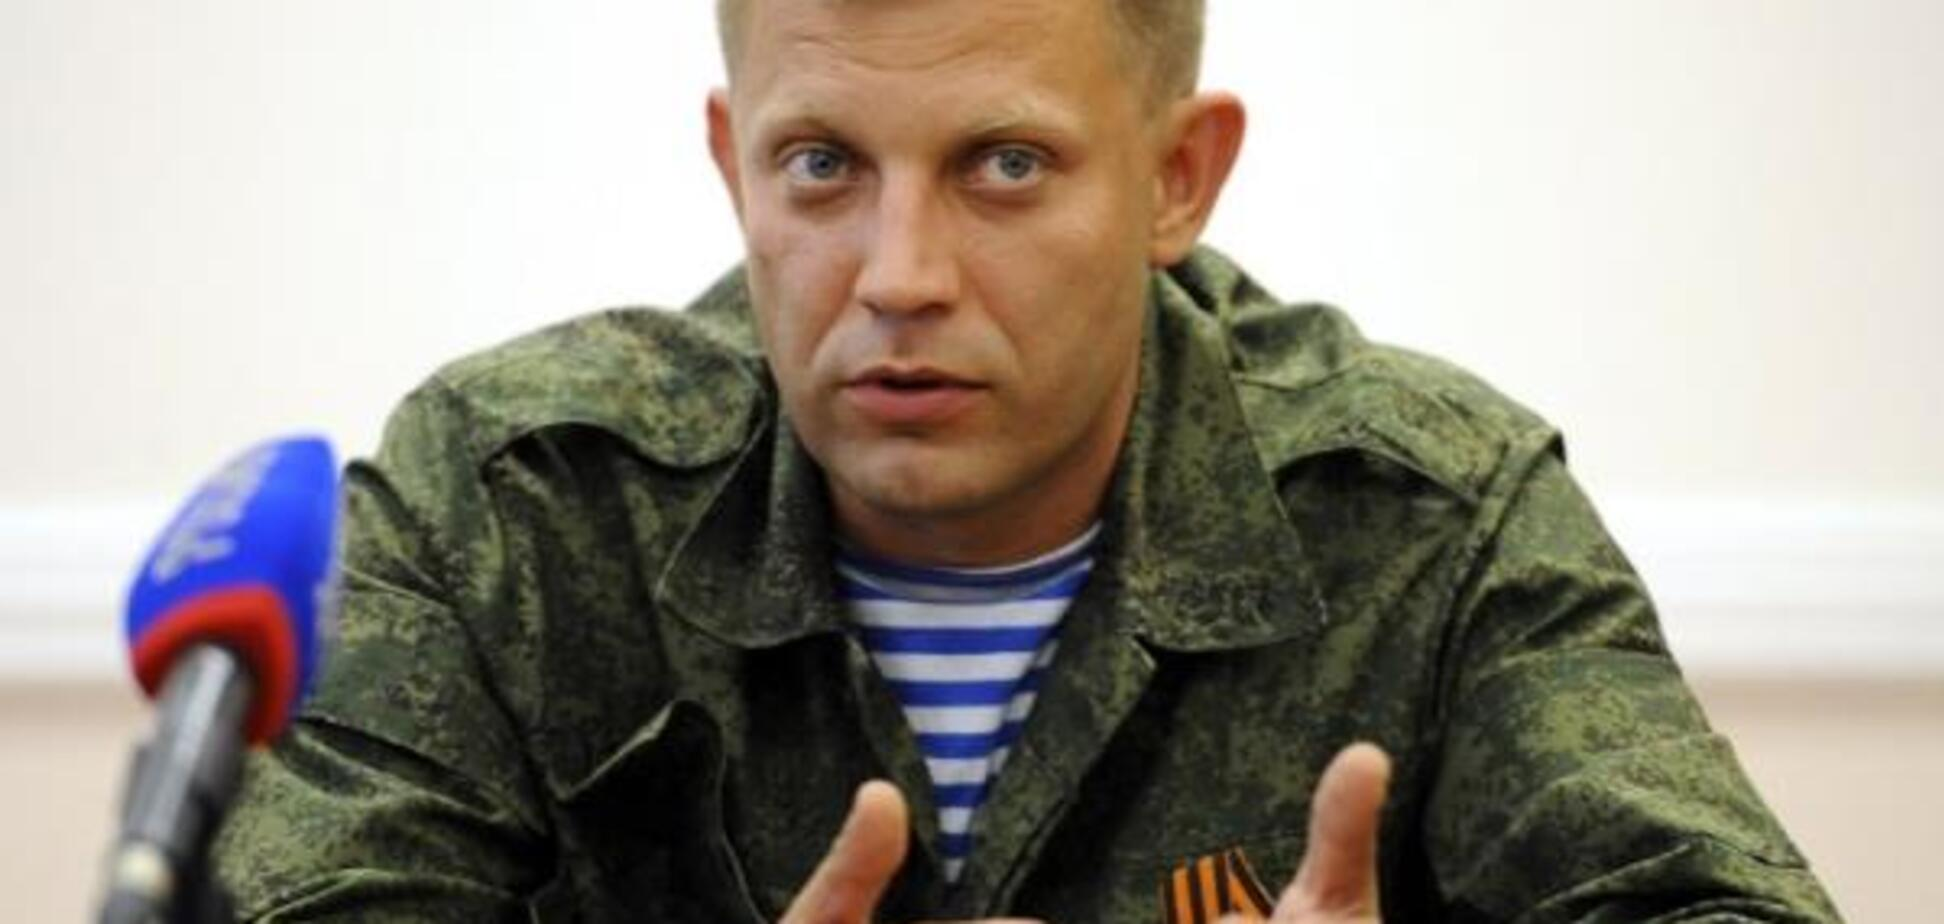 Ликвидация главарей 'Л/ДНР': астролог спрогнозировал судьбу Захарченко